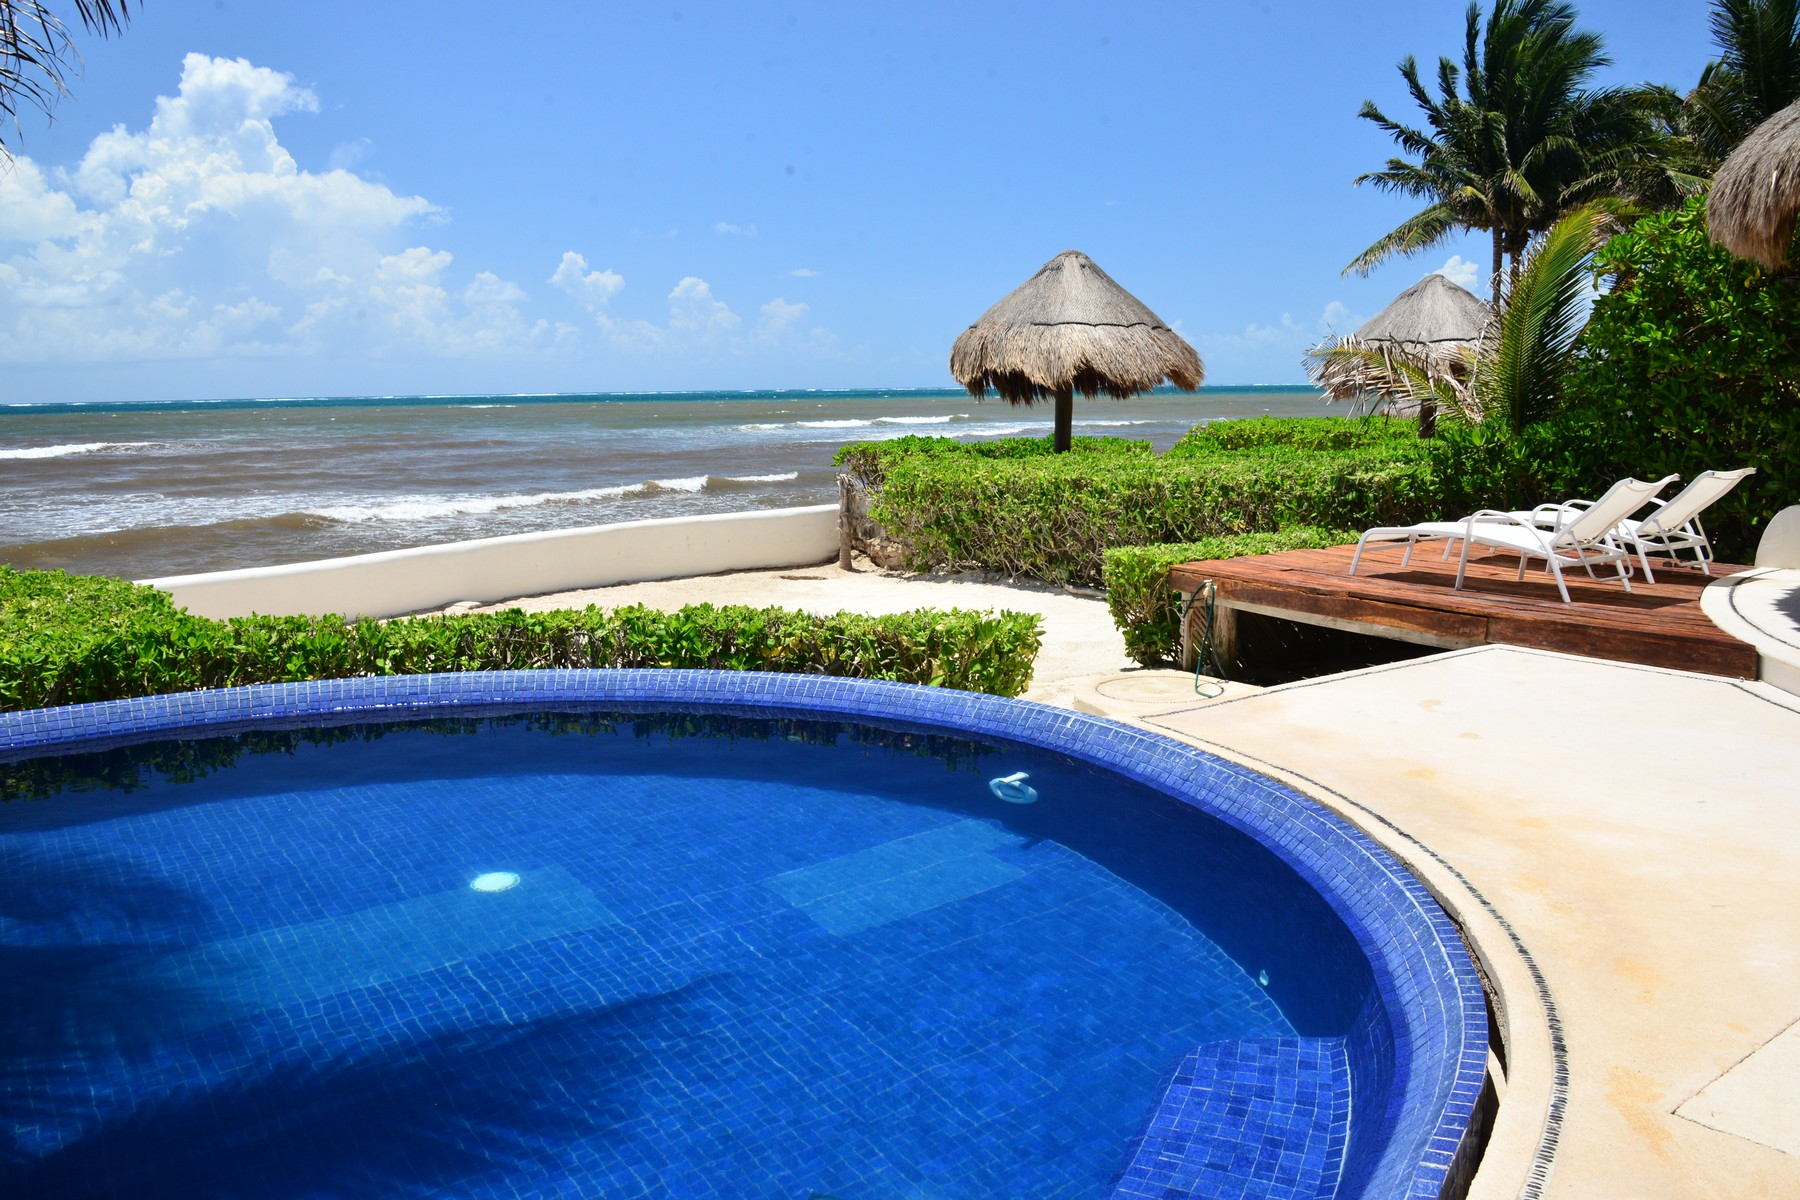 Additional photo for property listing at DEPARTAMENTO # 101 PARAISO FRENTE AL MAR Seafront Paradise – Unit #101 Predio Maria Irene, Supermzna 12, Mzna 21 13 Puerto Morelos, Quintana Roo 77930 México